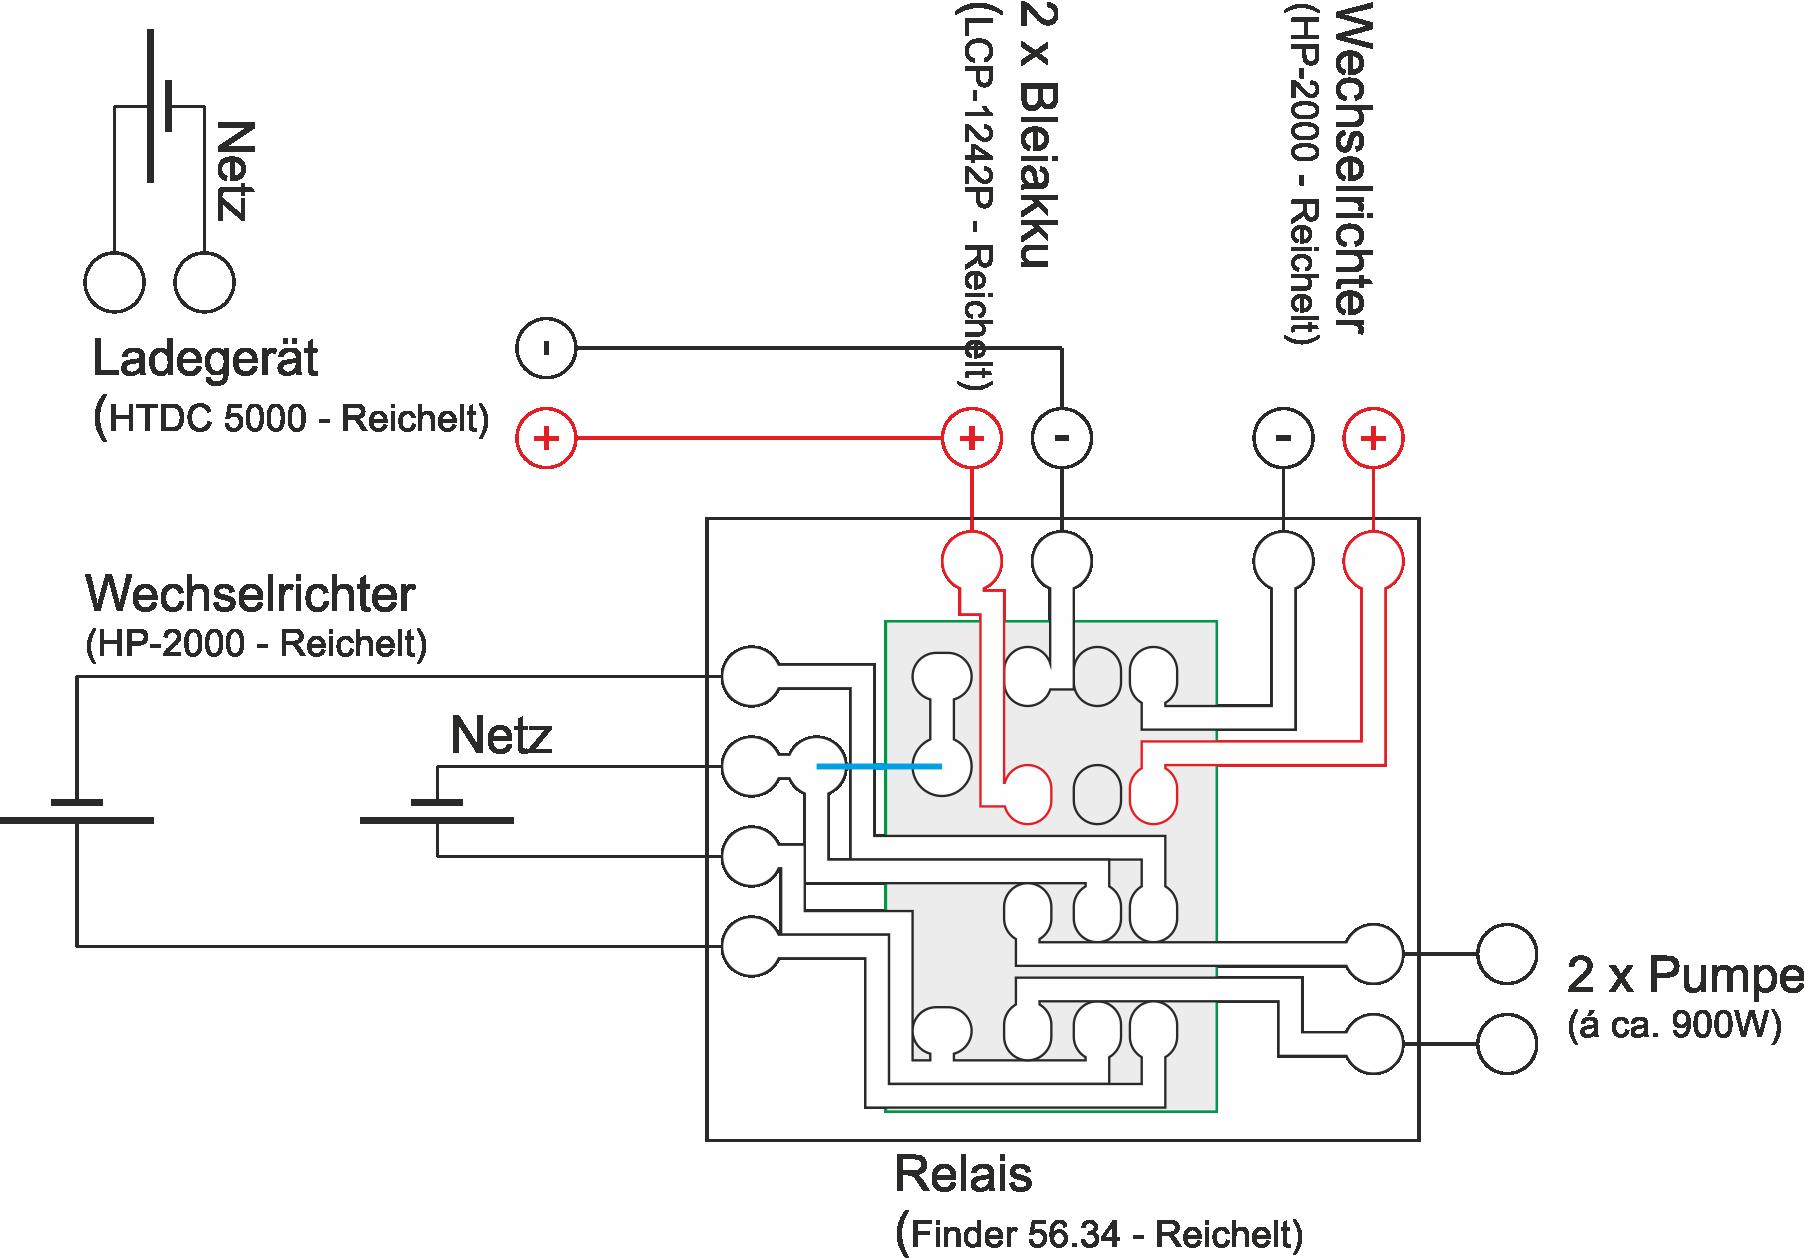 Groß Licht Relais Diagramm Fotos - Schaltplan Serie Circuit ...